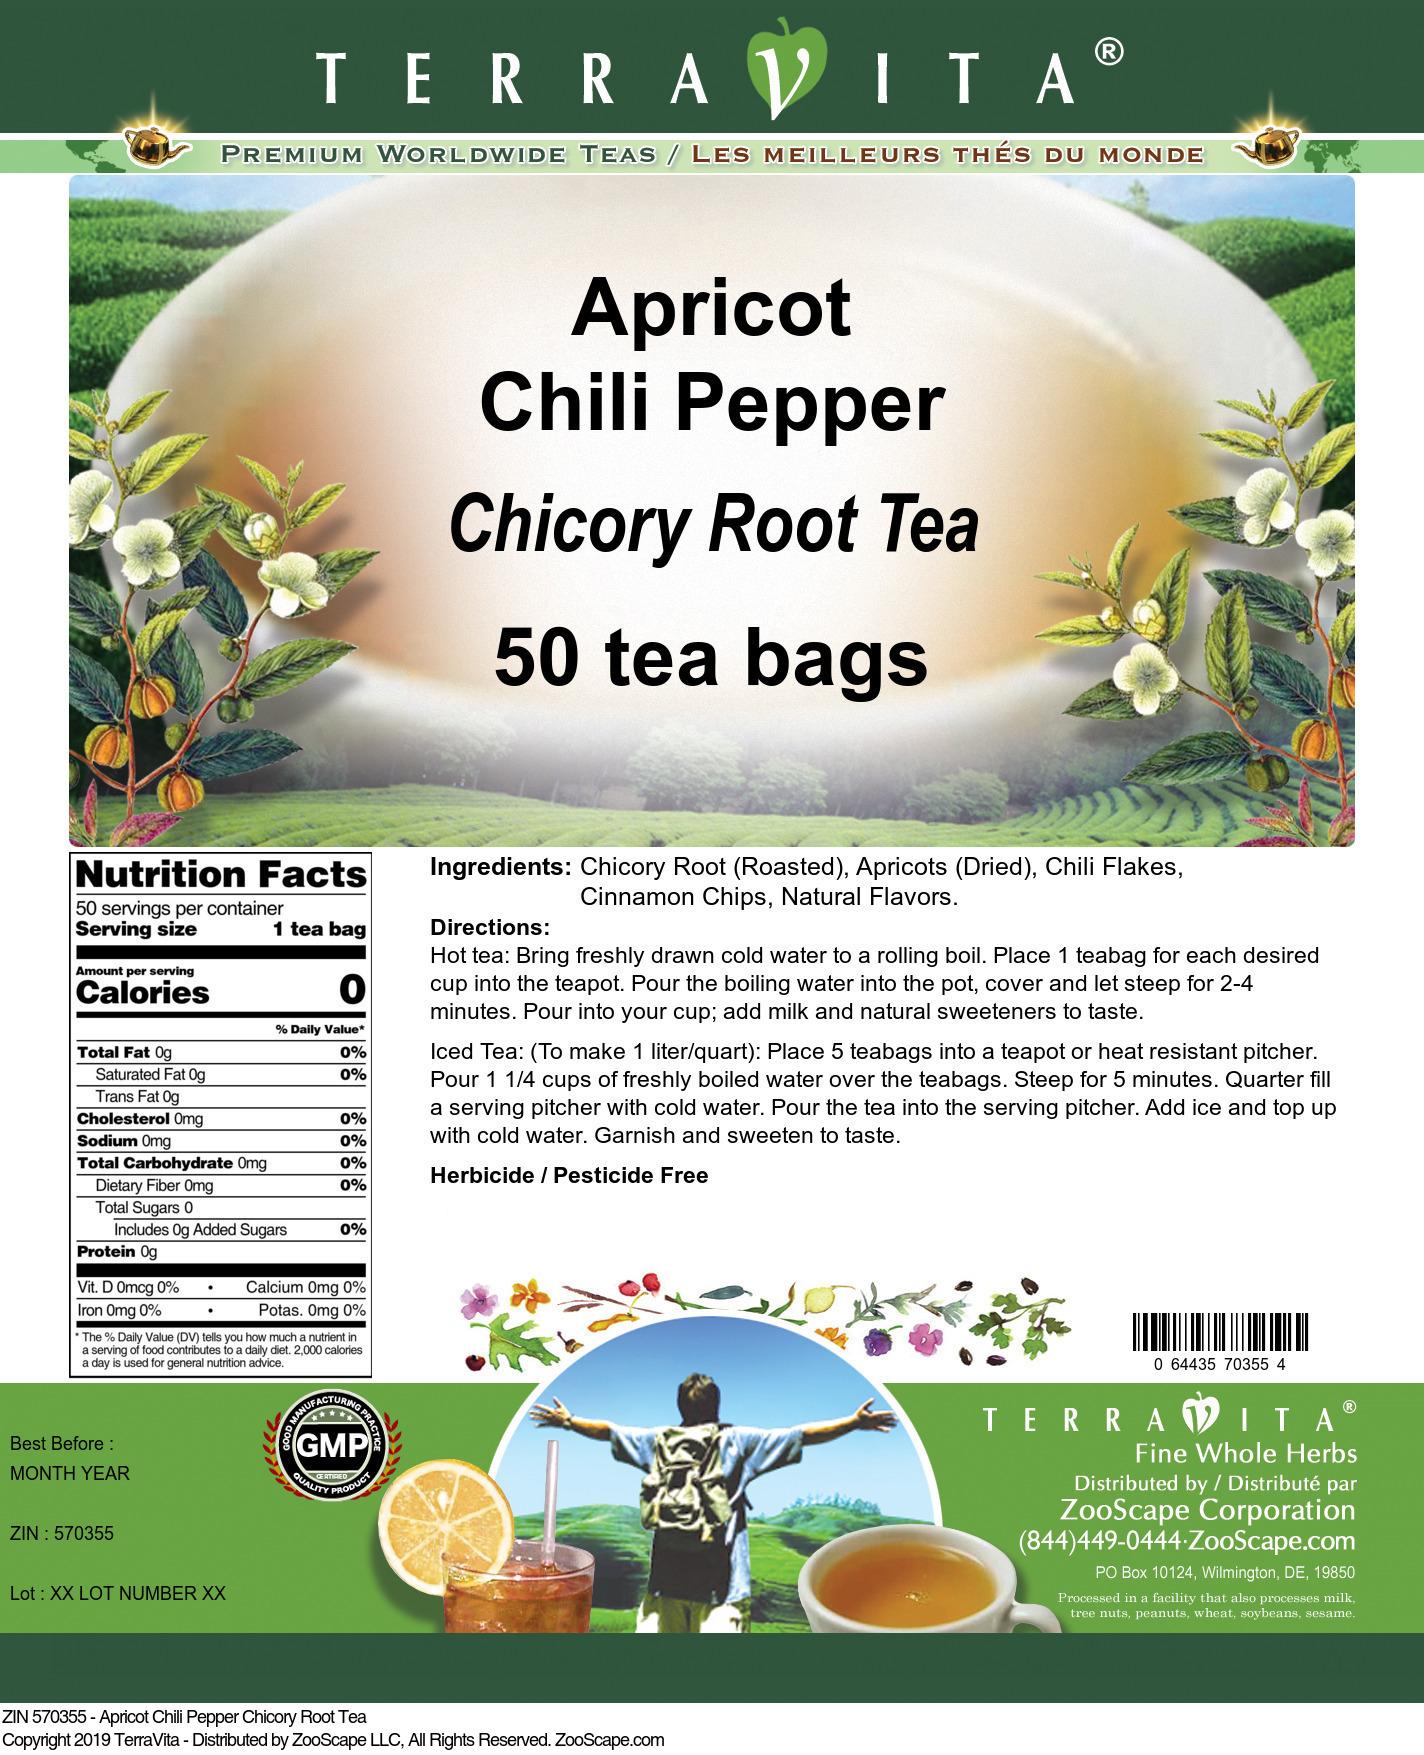 Apricot Chili Pepper Chicory Root Tea